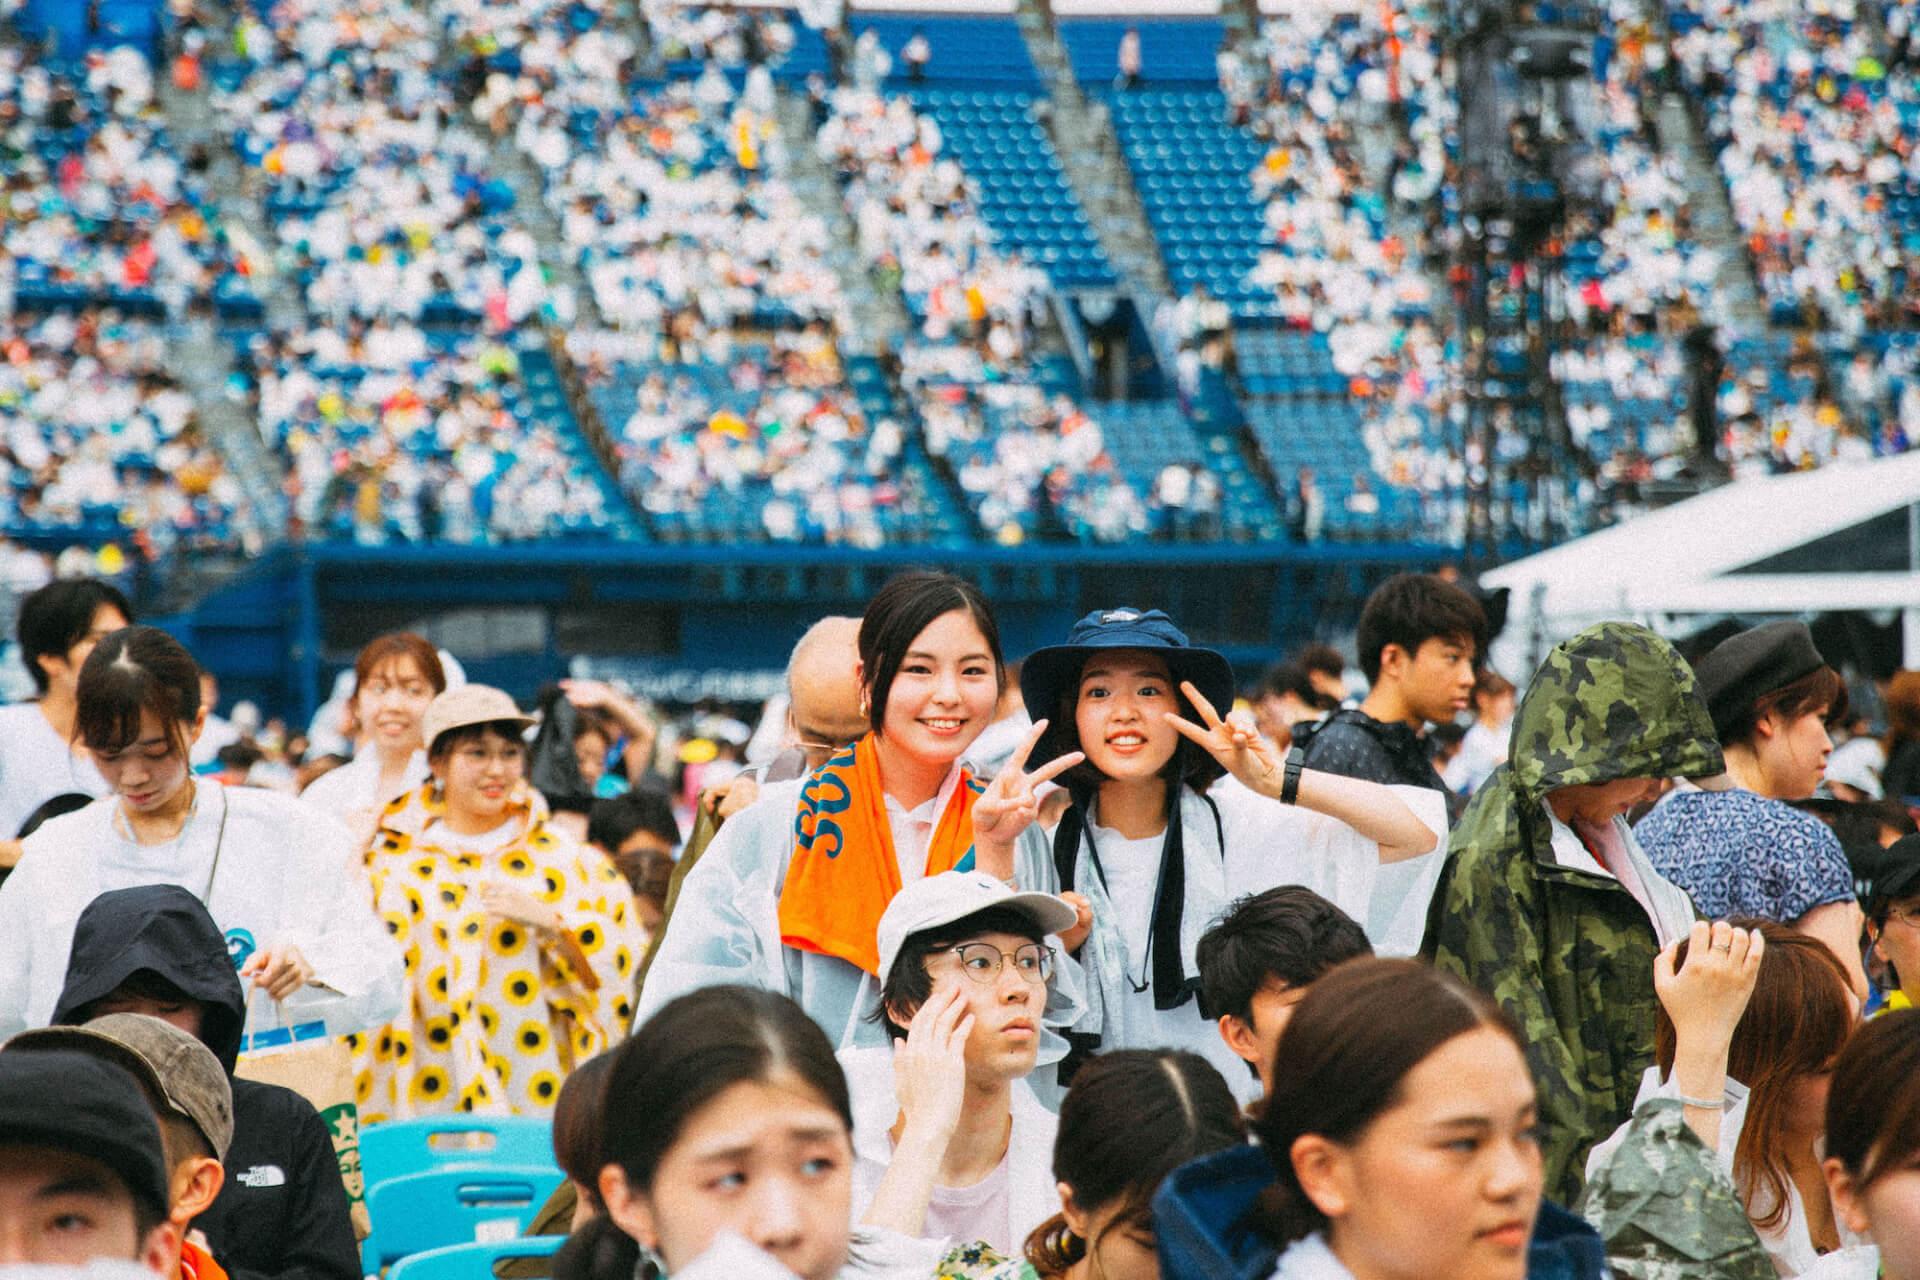 【Photo Documentary】Suchmos THE LIVE 横浜スタジアム report0920_suchmos_9